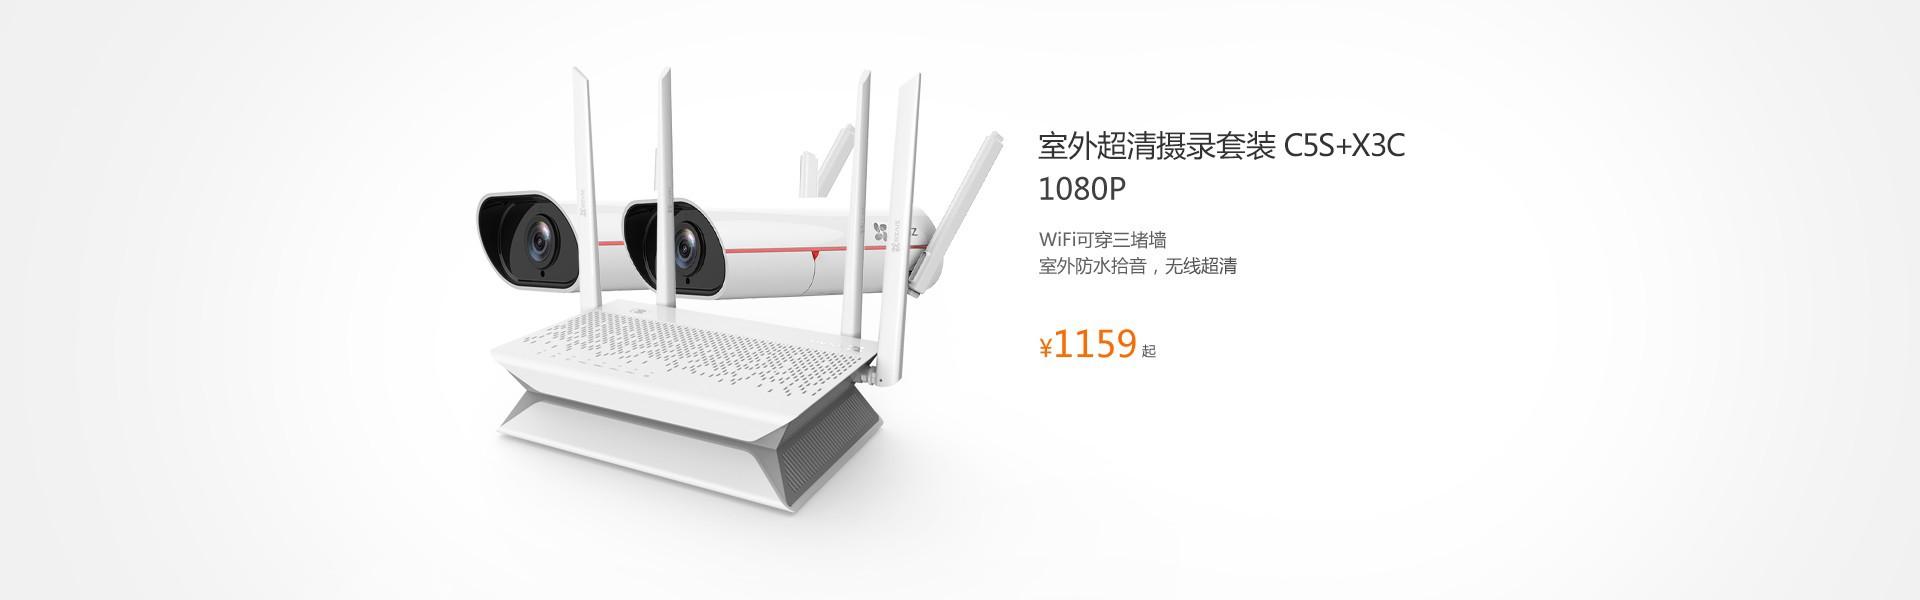 PC-C5S+X3C.jpg